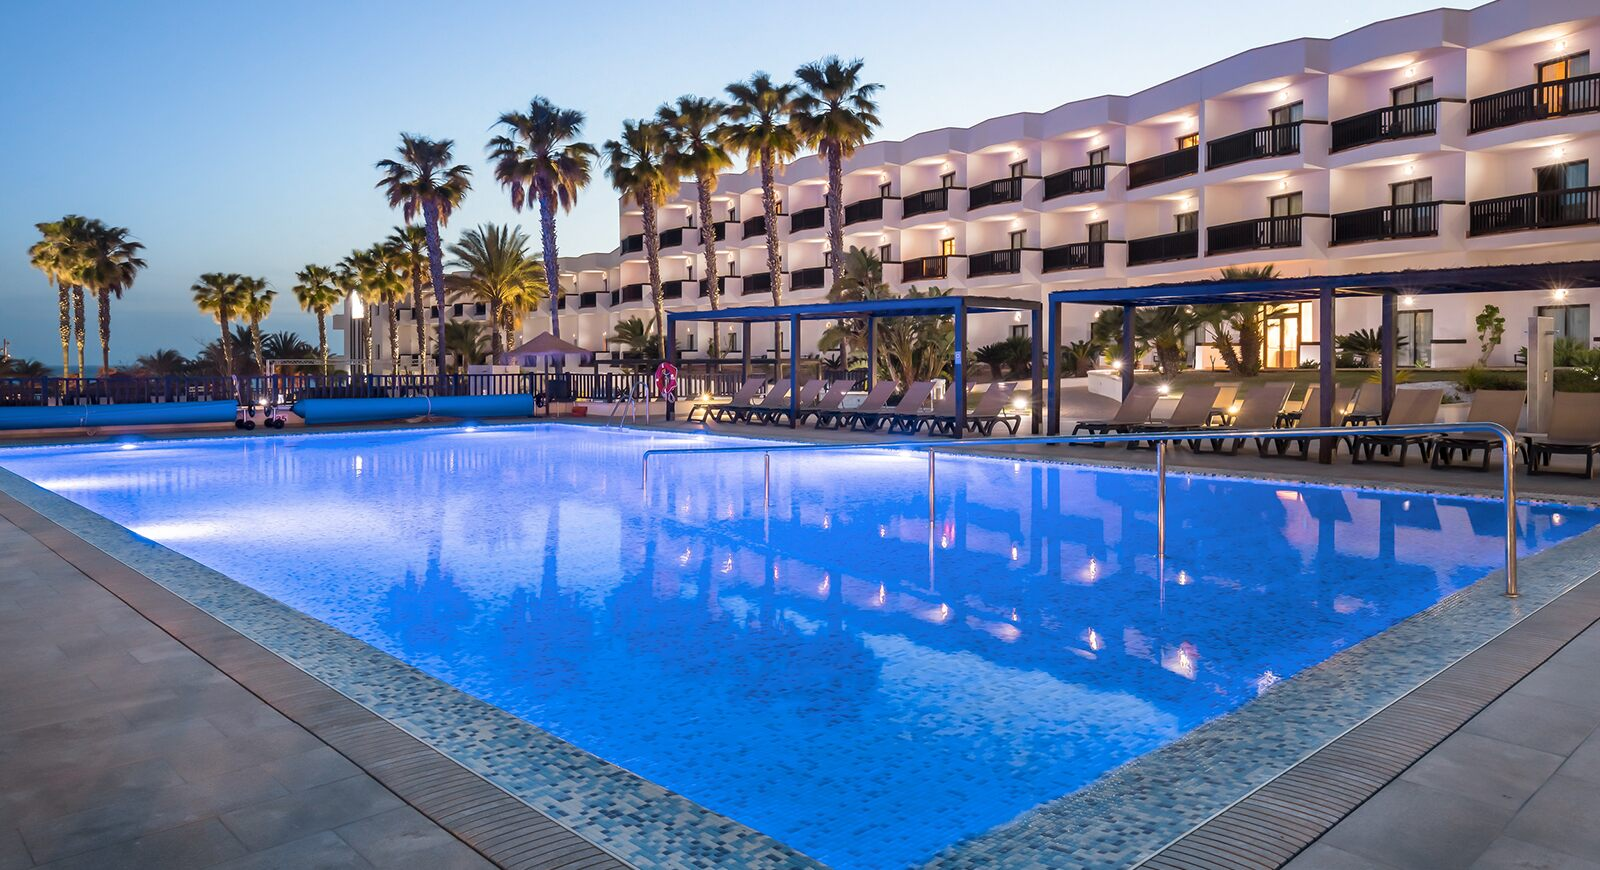 236-swimming-pool-59-hotel-barcelo-cabo-de-gata_tcm20-137230_w1600_h870_n.jpg